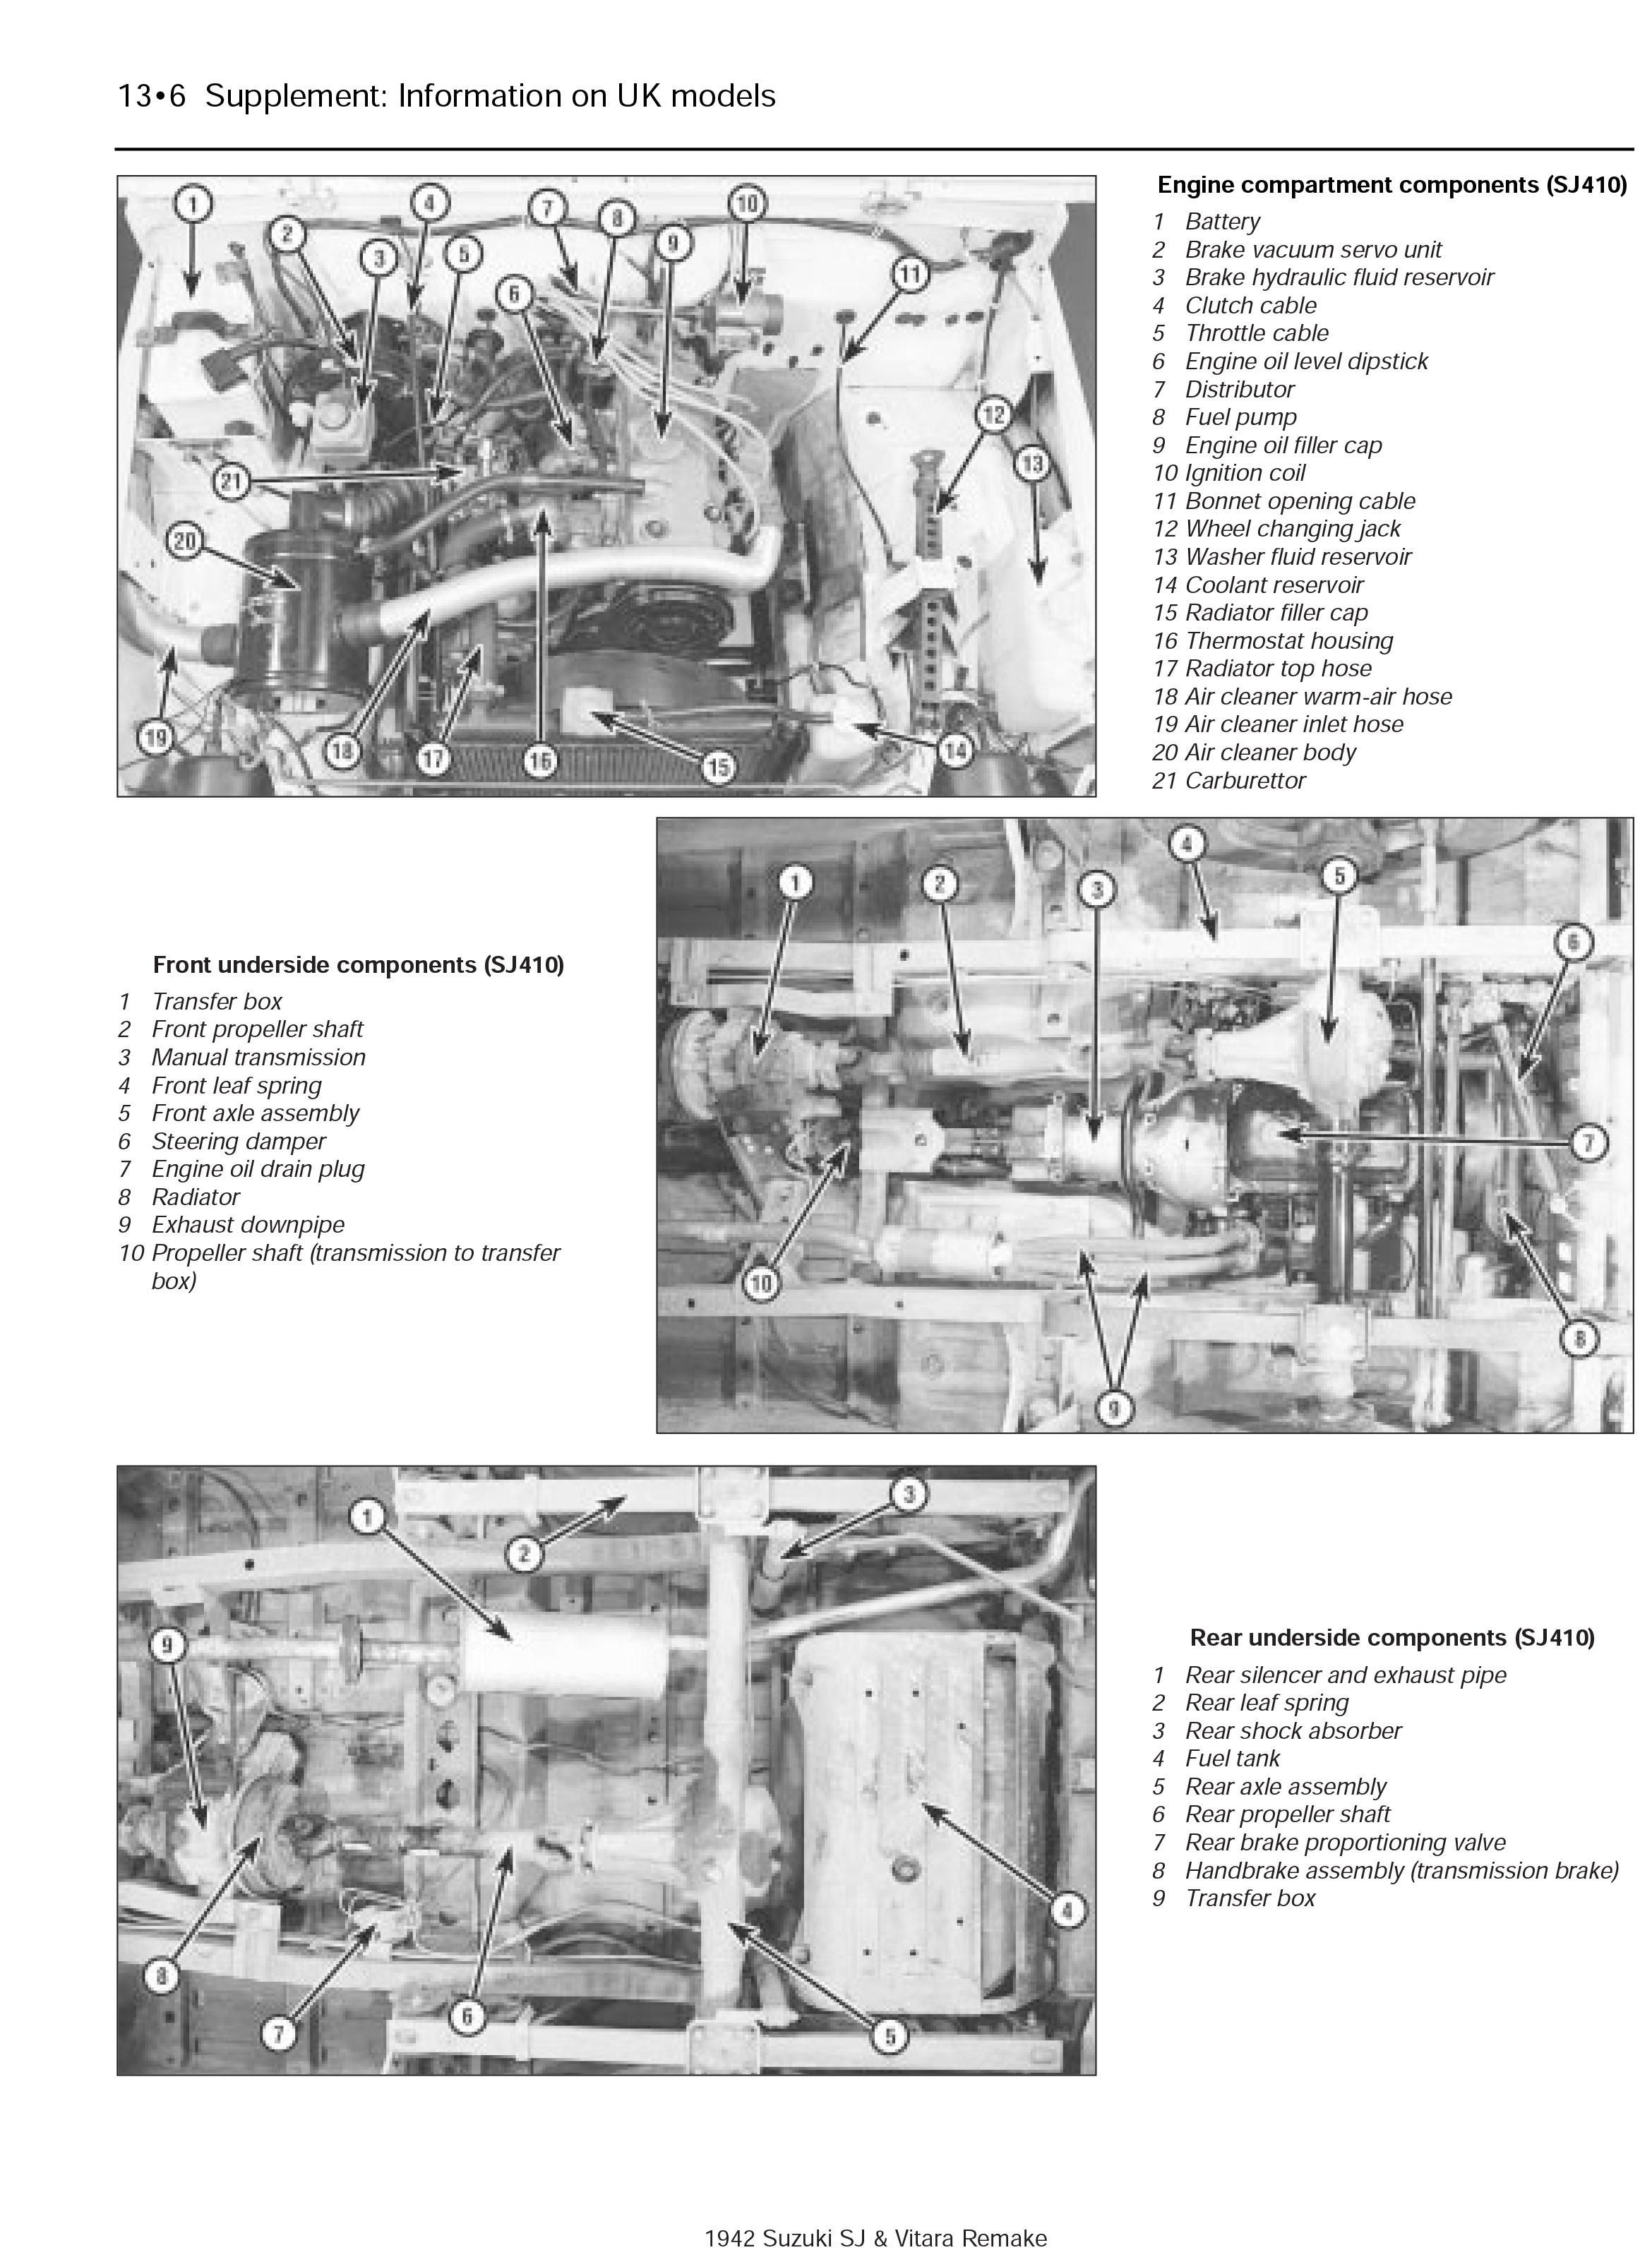 Suzuki Manual Sj410 Jeep Cj Suspension Parts Exploded View Diagram Years 19721975 Image Is Loading Workshop Or Repair Santana Sj413 Array Sj Haynes Manuals Rh Com